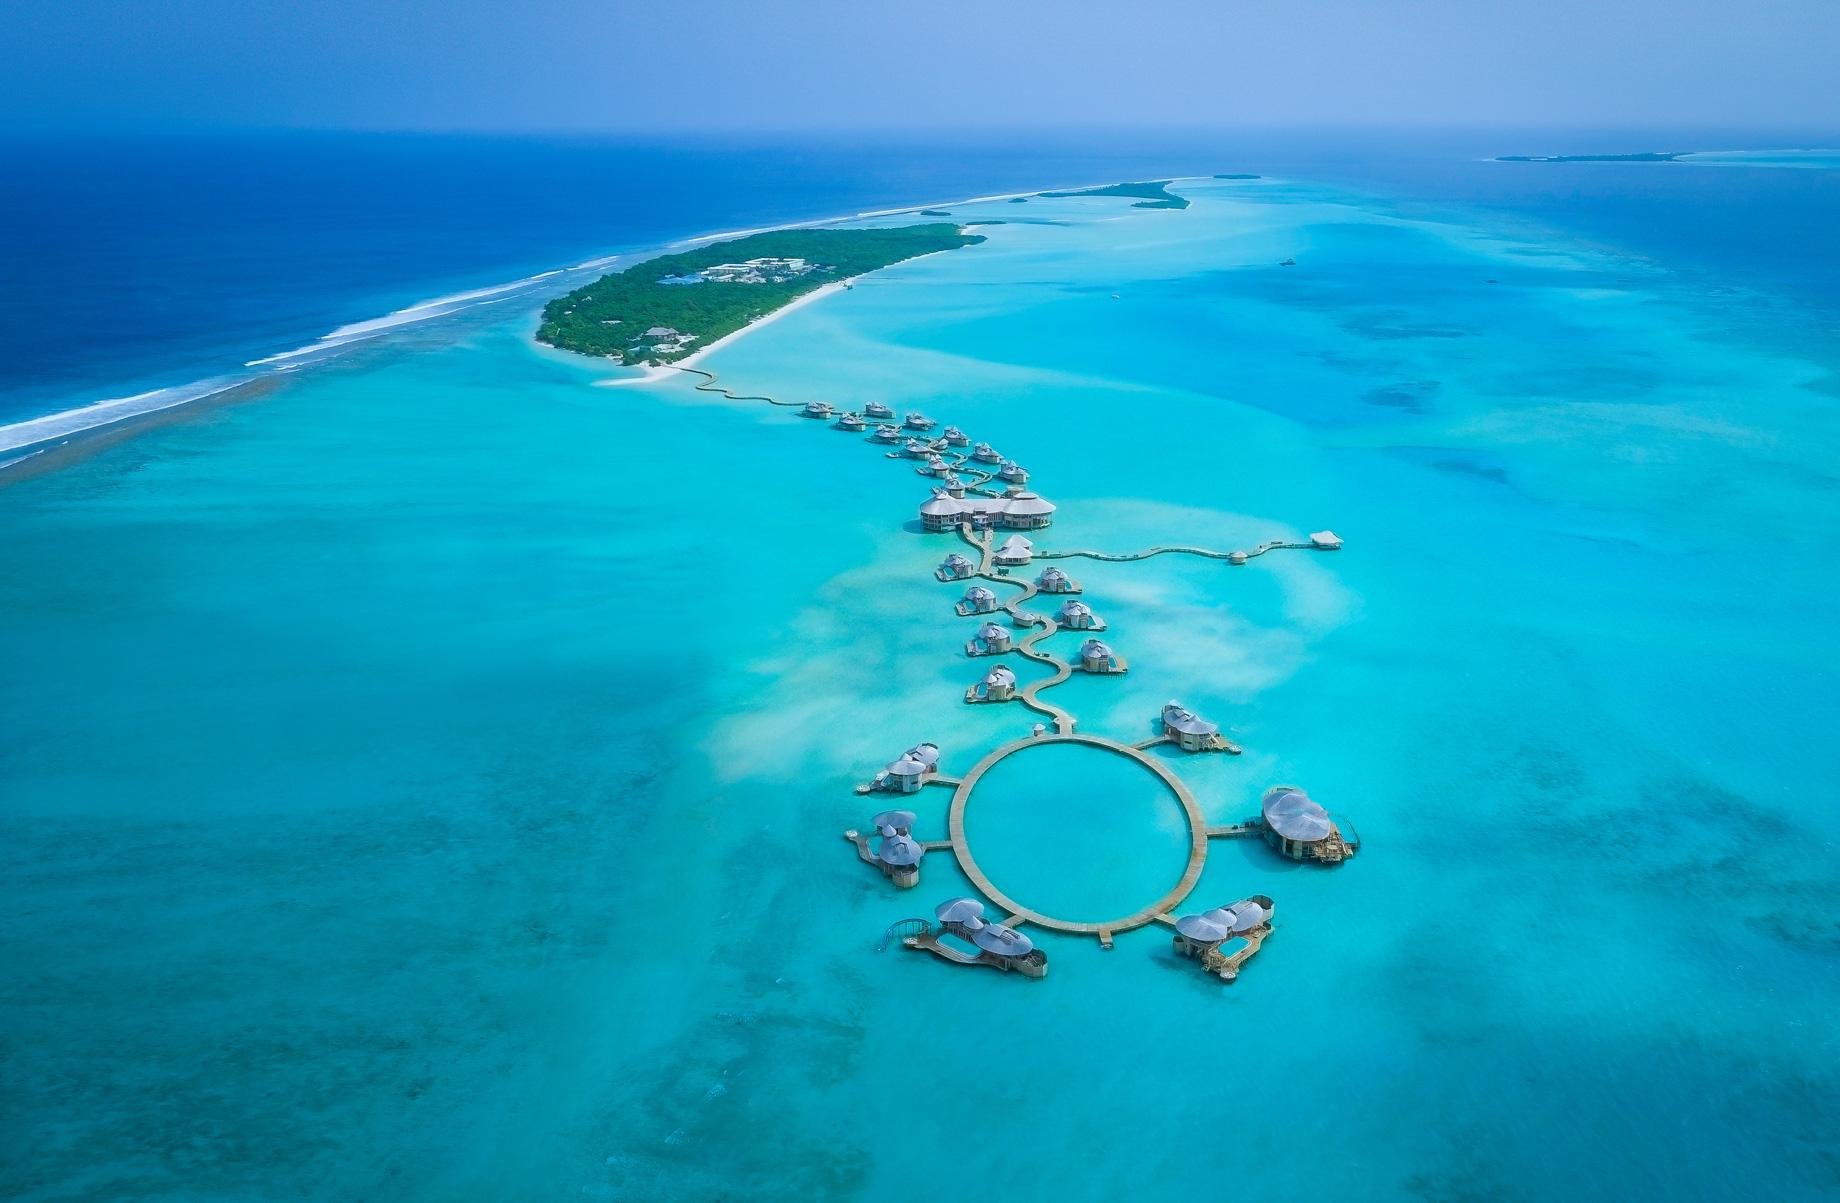 Soneva Jani Luxury Resort - Noonu Atoll, Medhufaru, Maldives